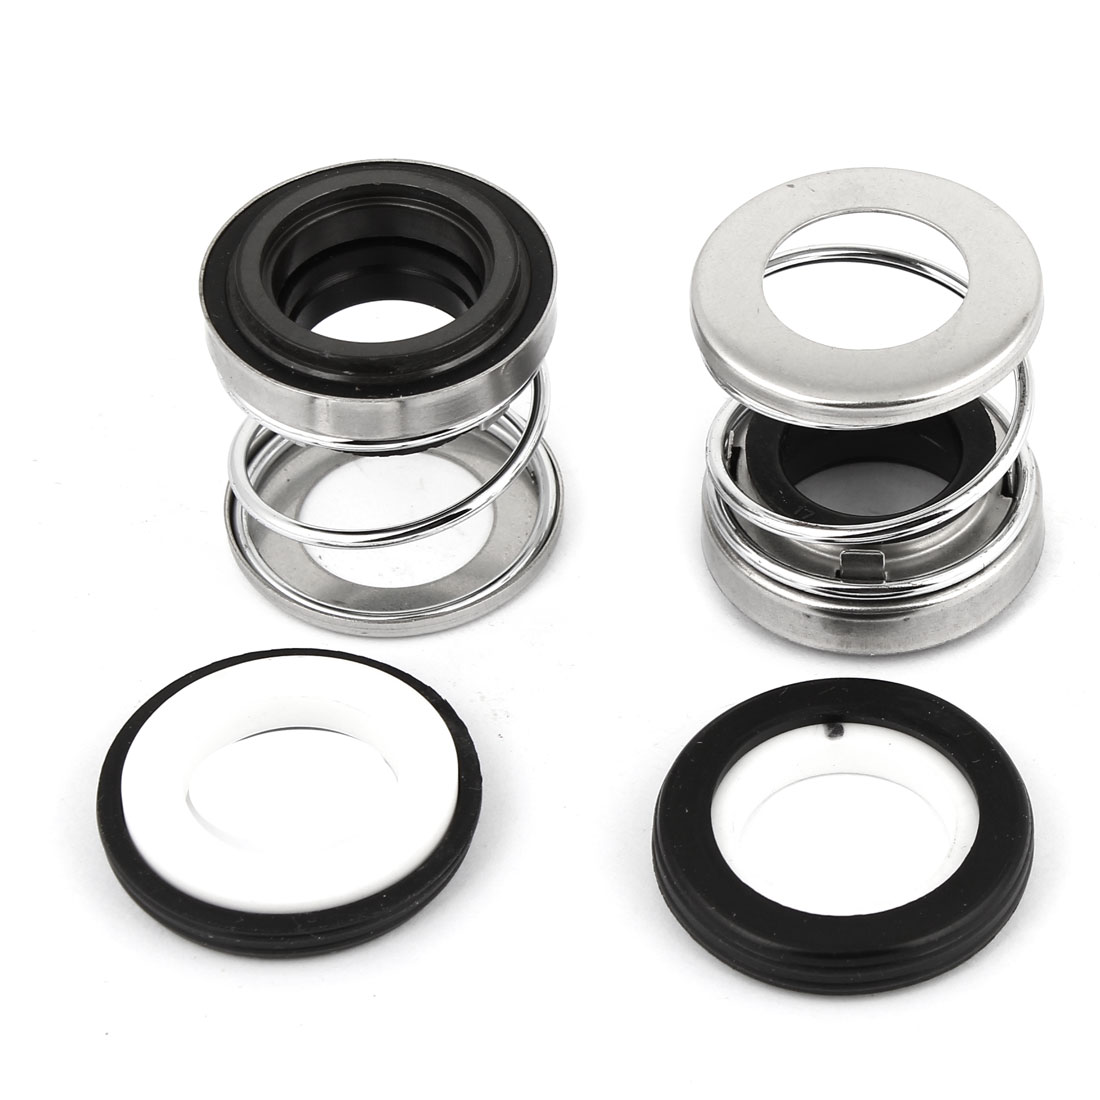 2 Pcs 17mm Innner Dia Ceramic Rotary Ring Water Pump Mechanical Sealing